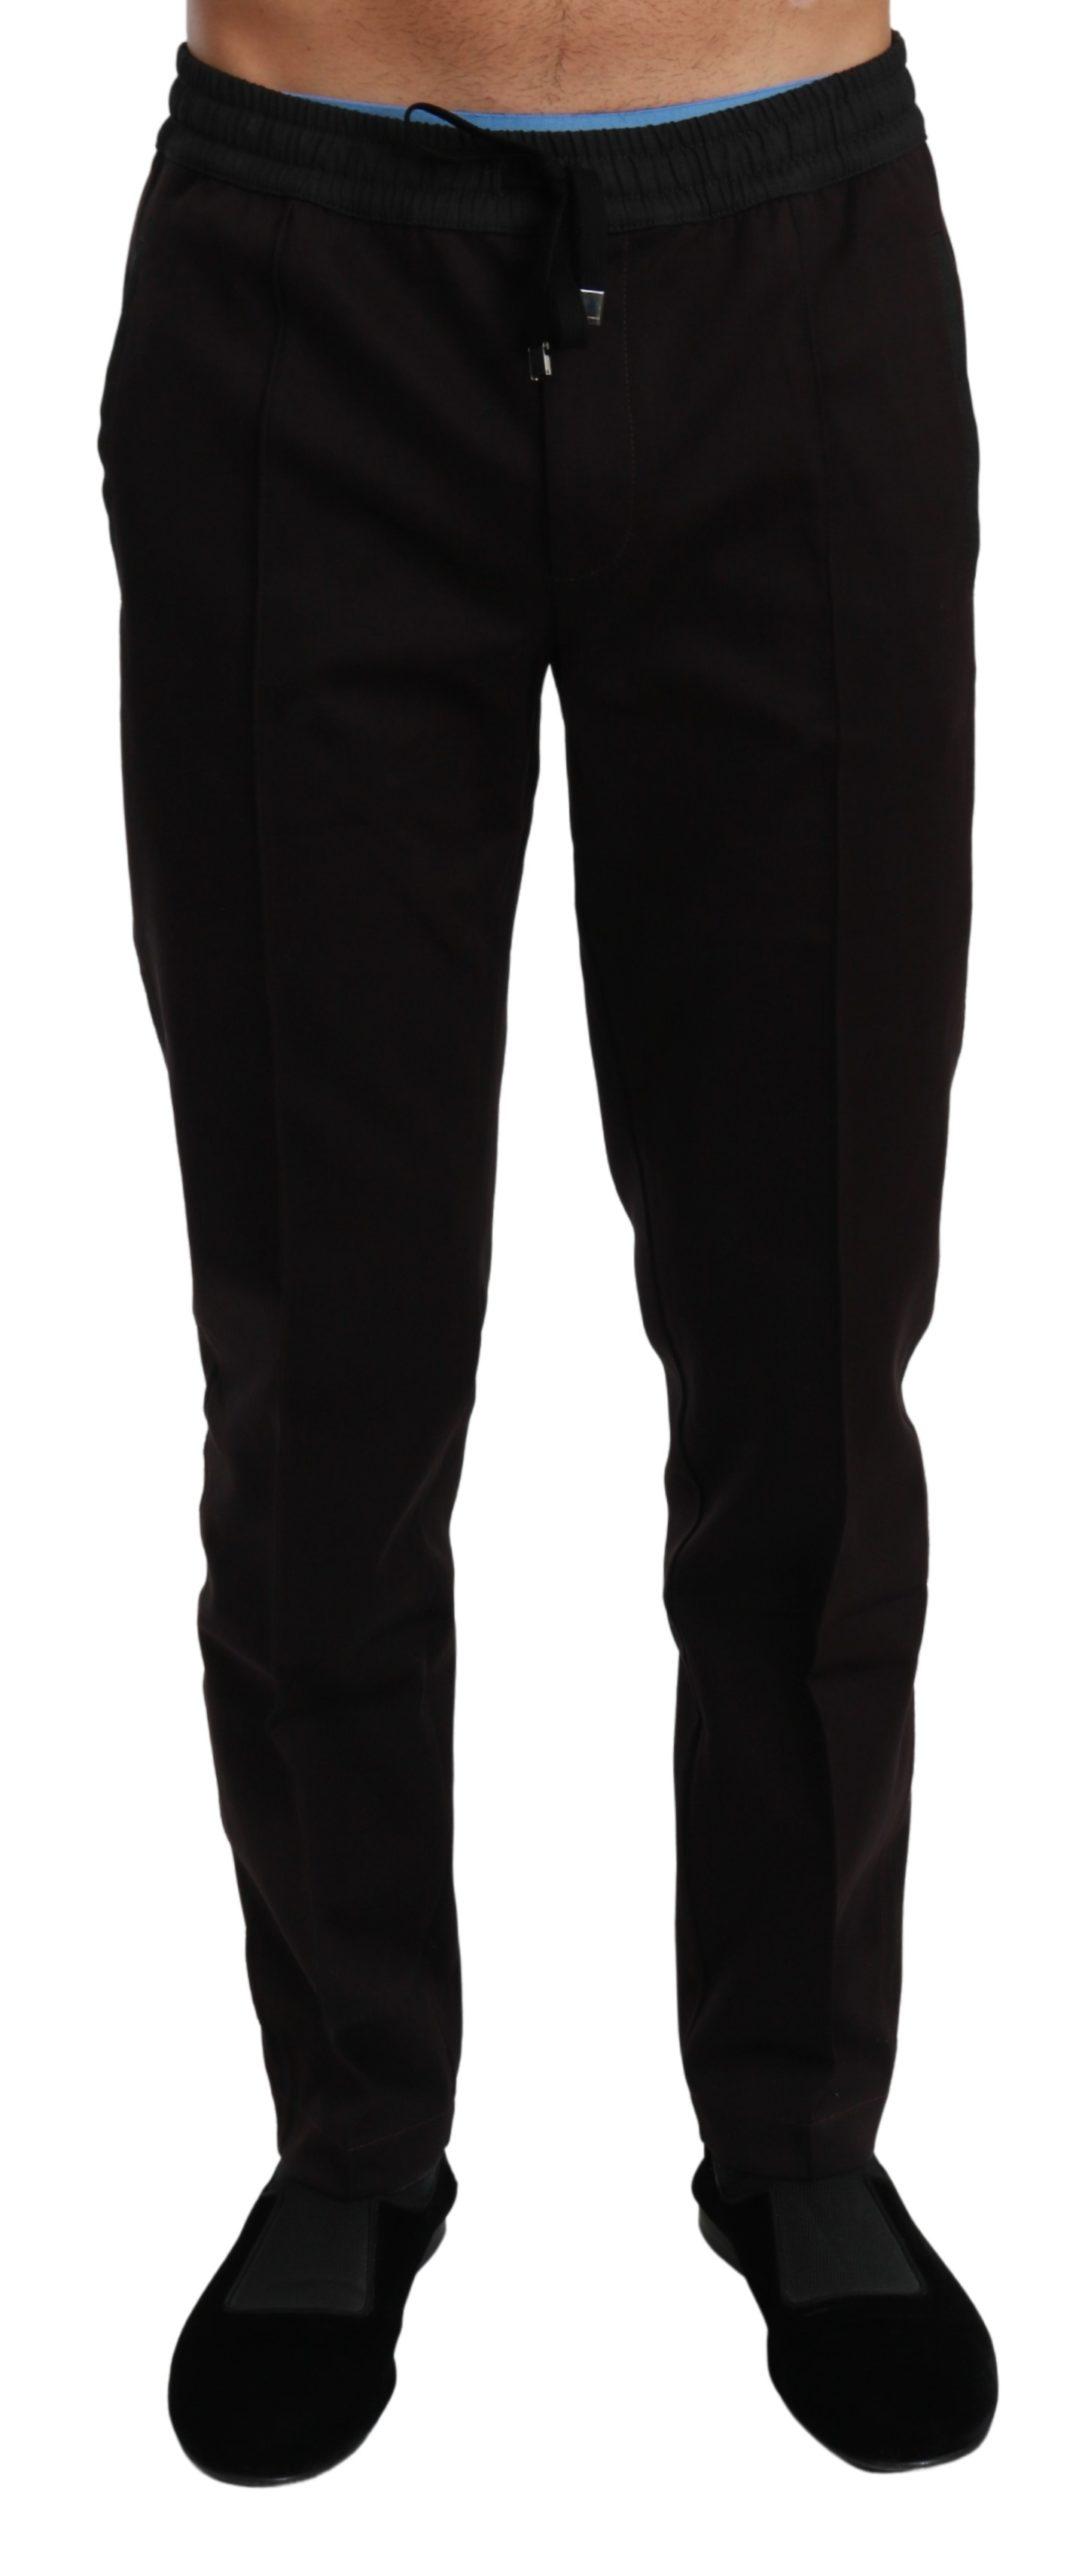 Dolce & Gabbana Men's Casual Cotton Trouser Purple PAN70978 - IT44 | XS